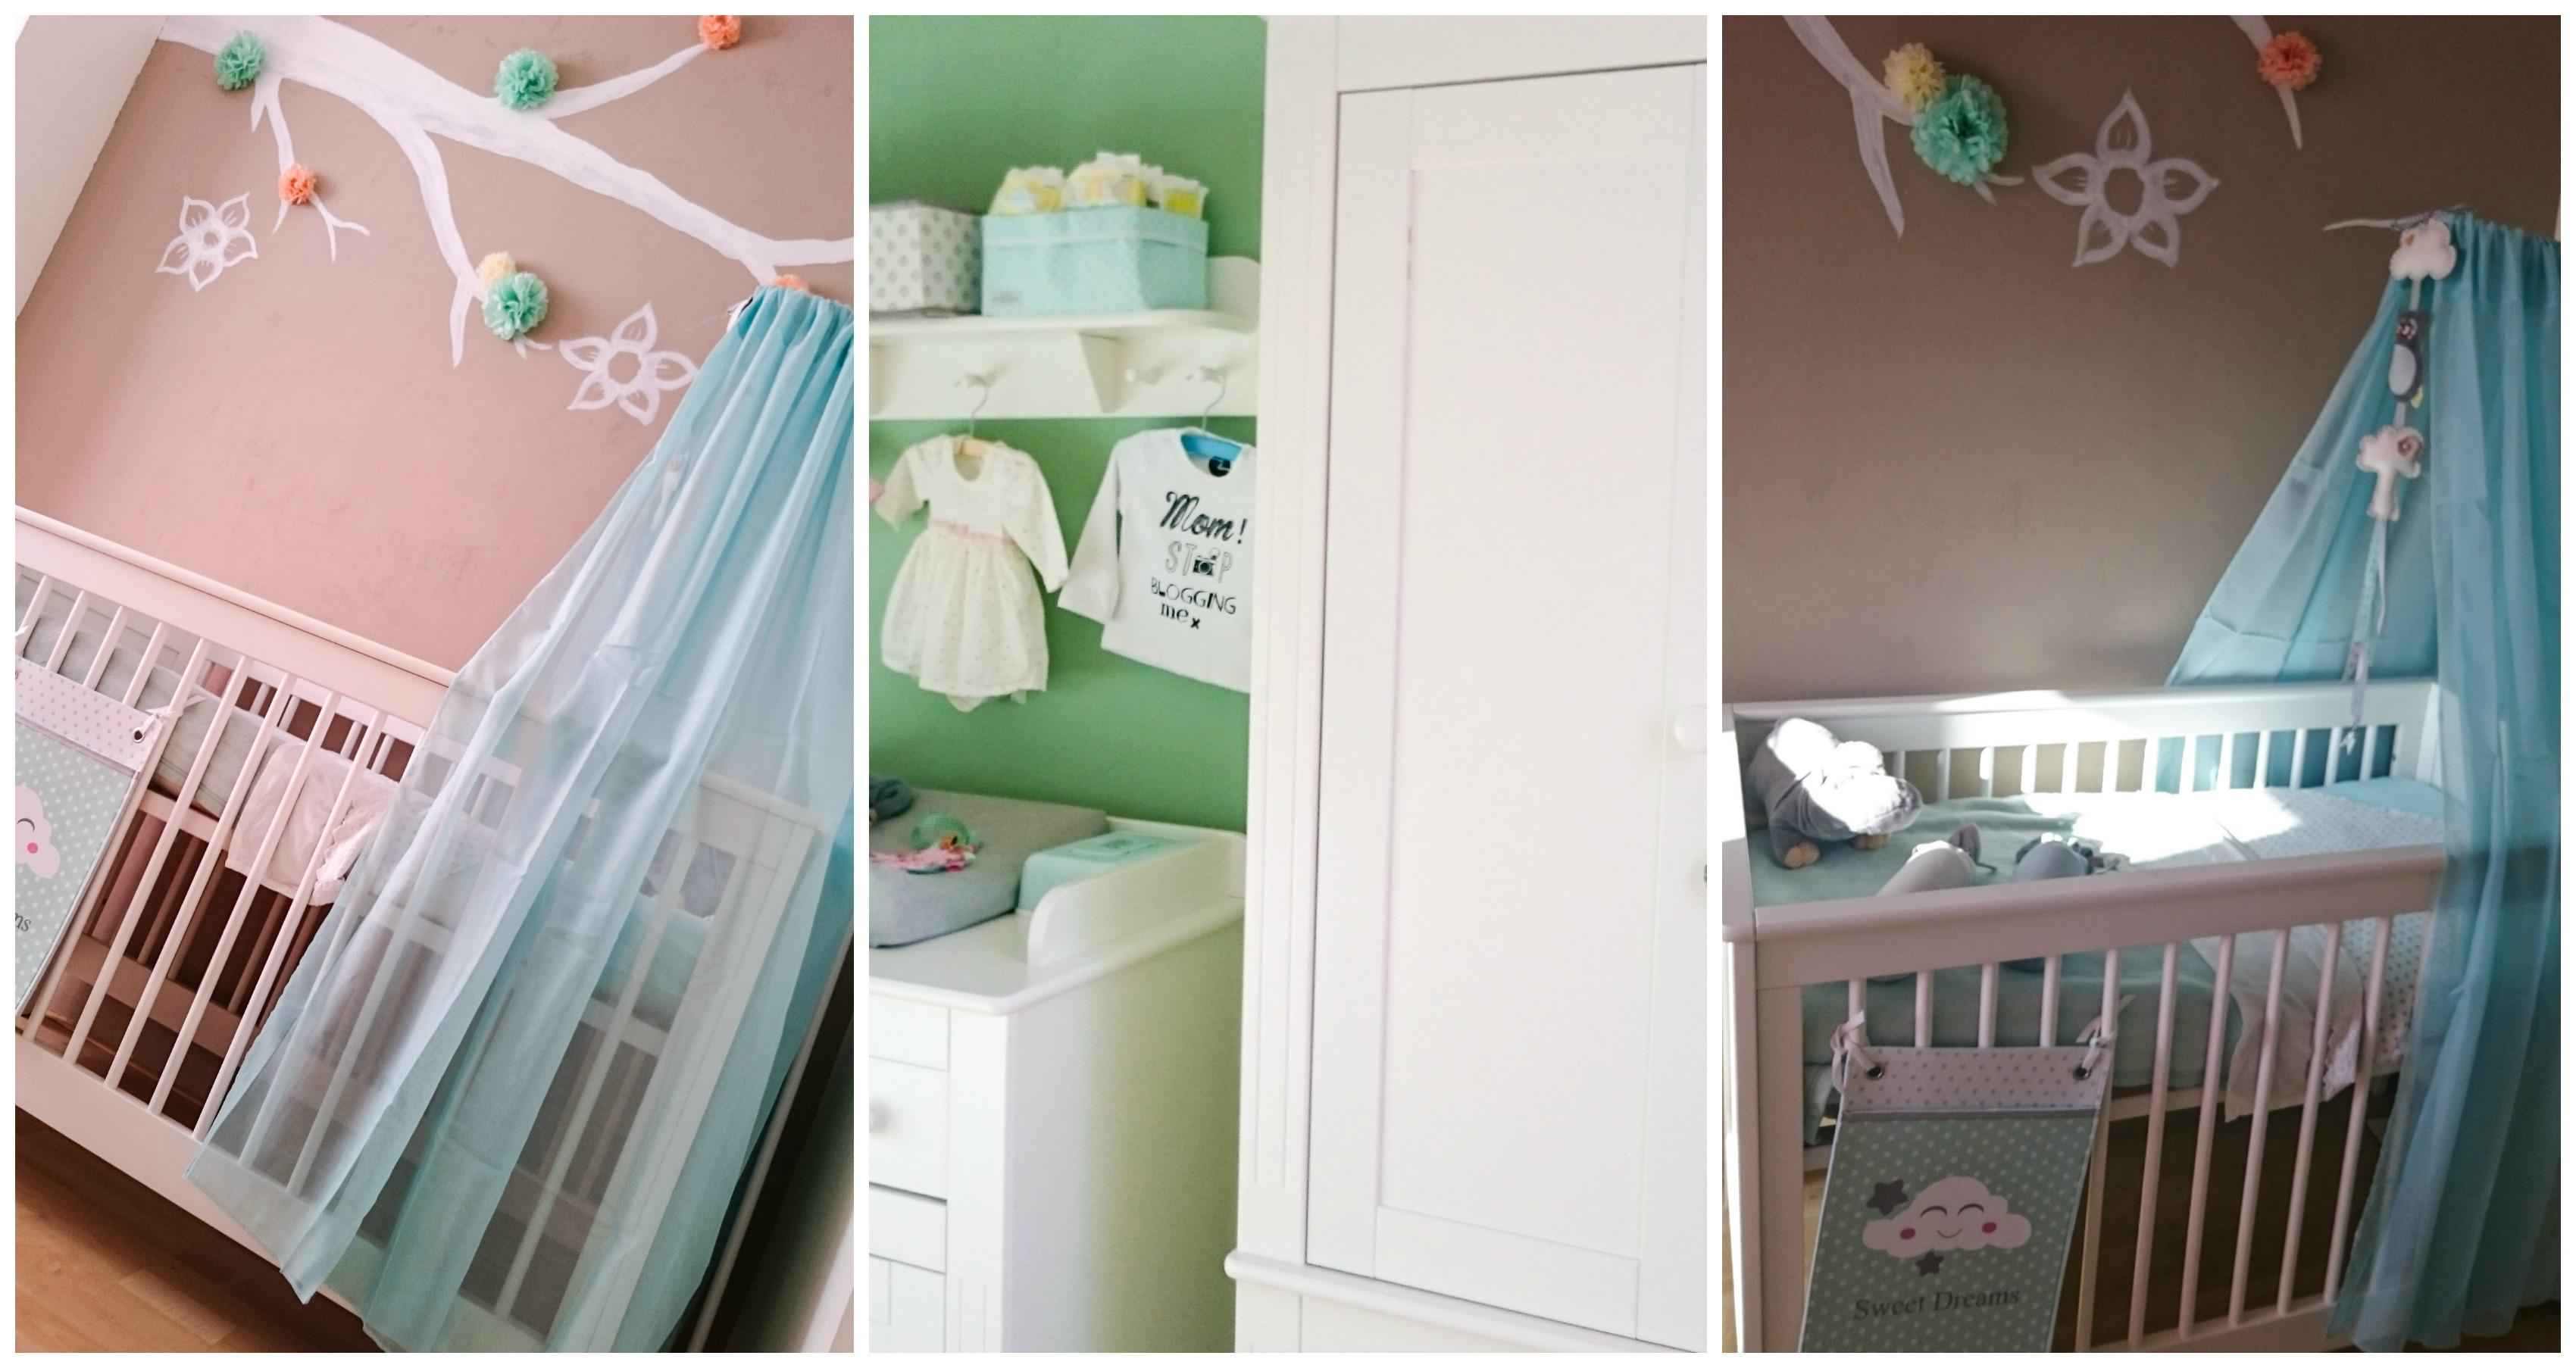 Mijn mintgroene babykamer | GoodGirlsCompany